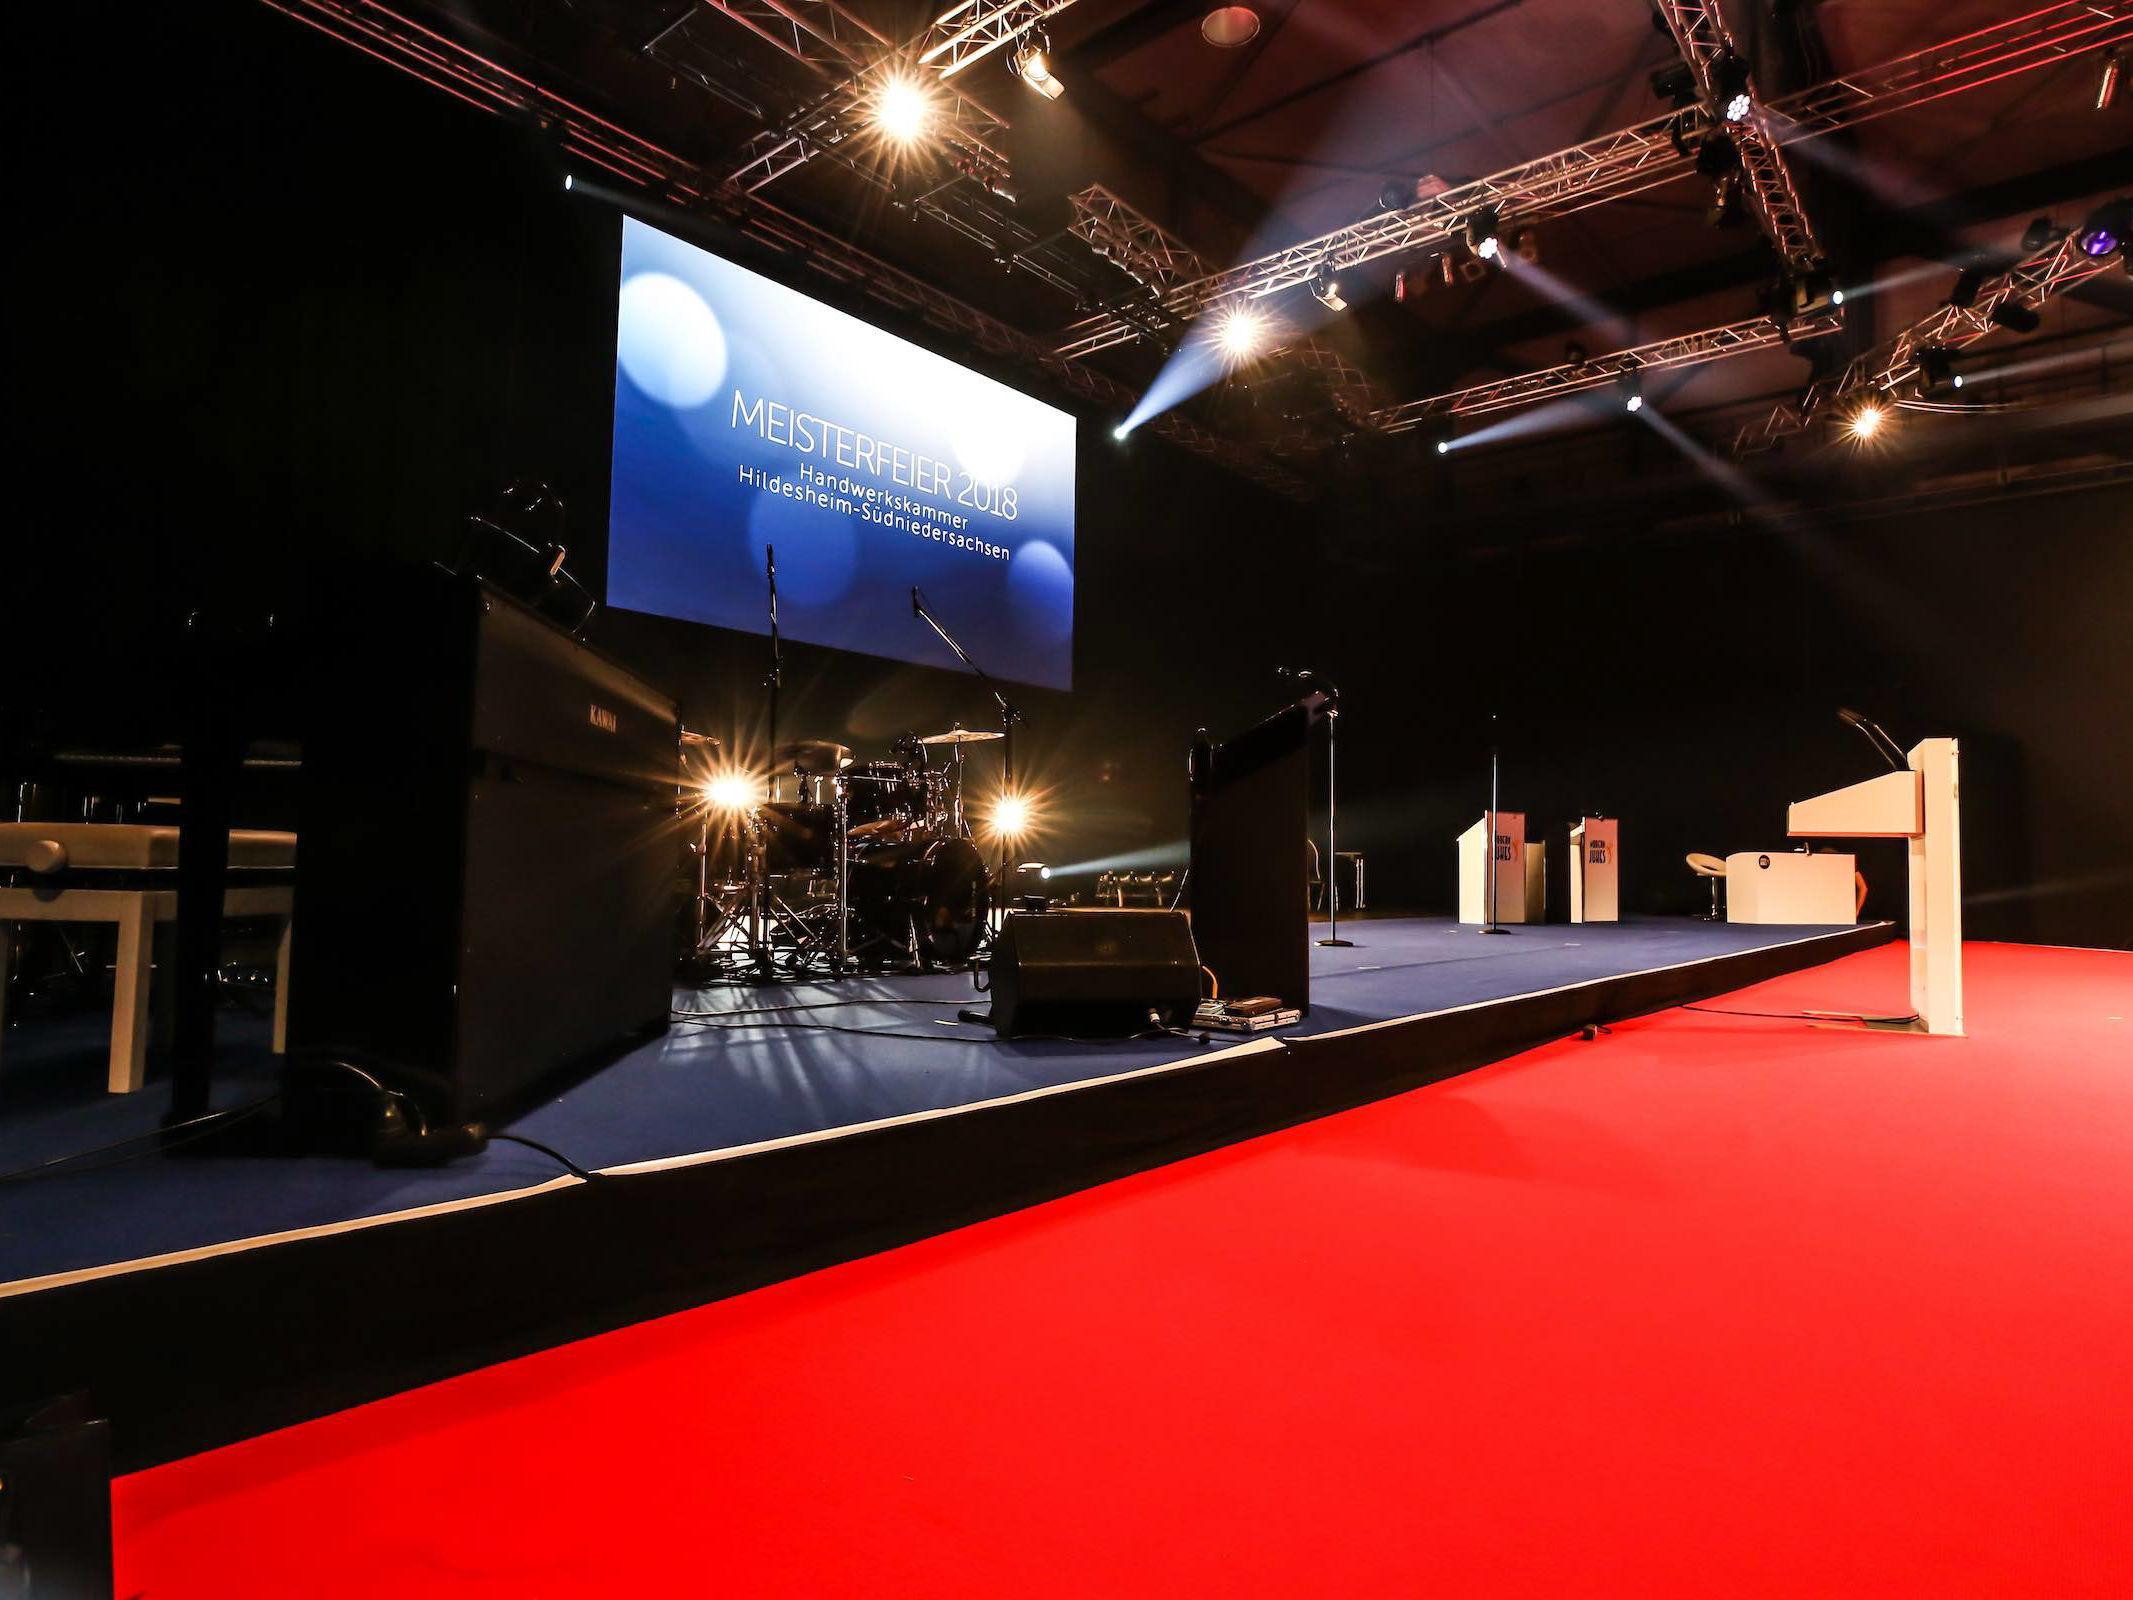 Eventplanung   Eventausstatung   Hannover   Kongresse   Shows   Galas   Modenschauen   Produktpräsentationen   Bühnen   Licht   LCD   Leinwand   Tontechnik   Veranstaltungslogistik   Catering   Künstler